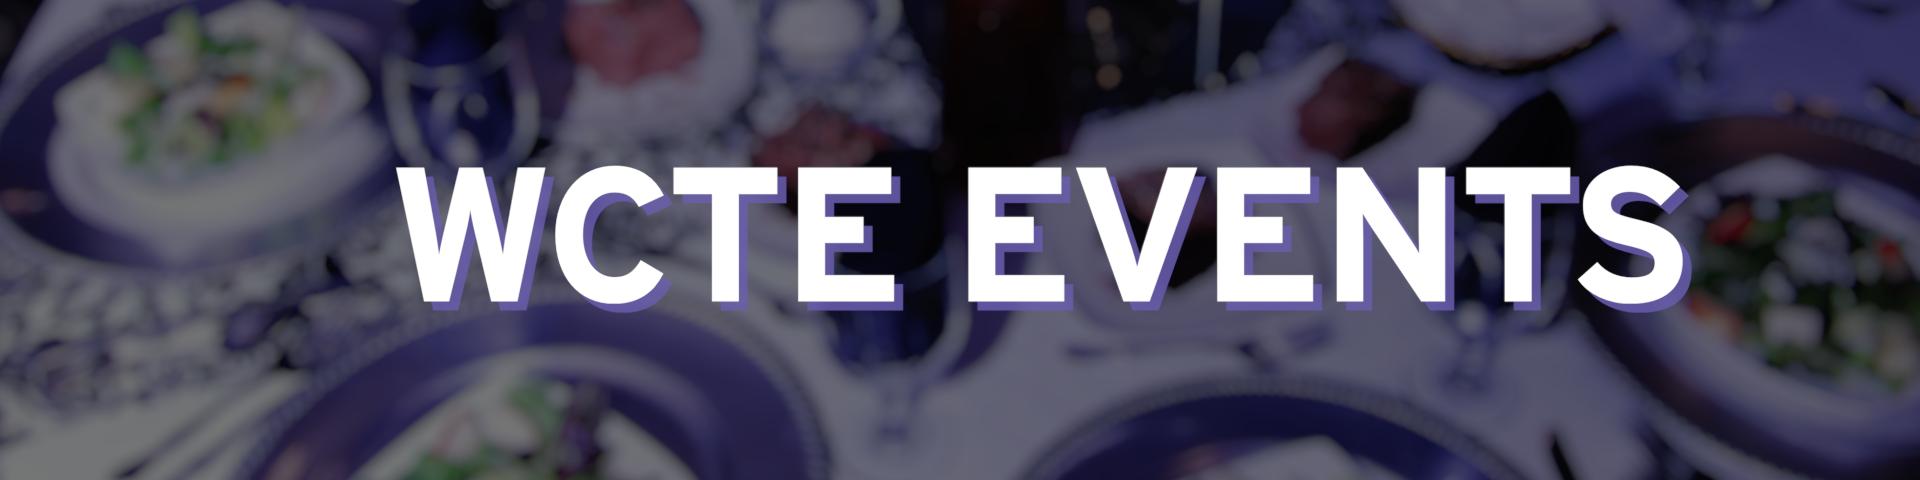 WCTE EVENTS 4x1.png